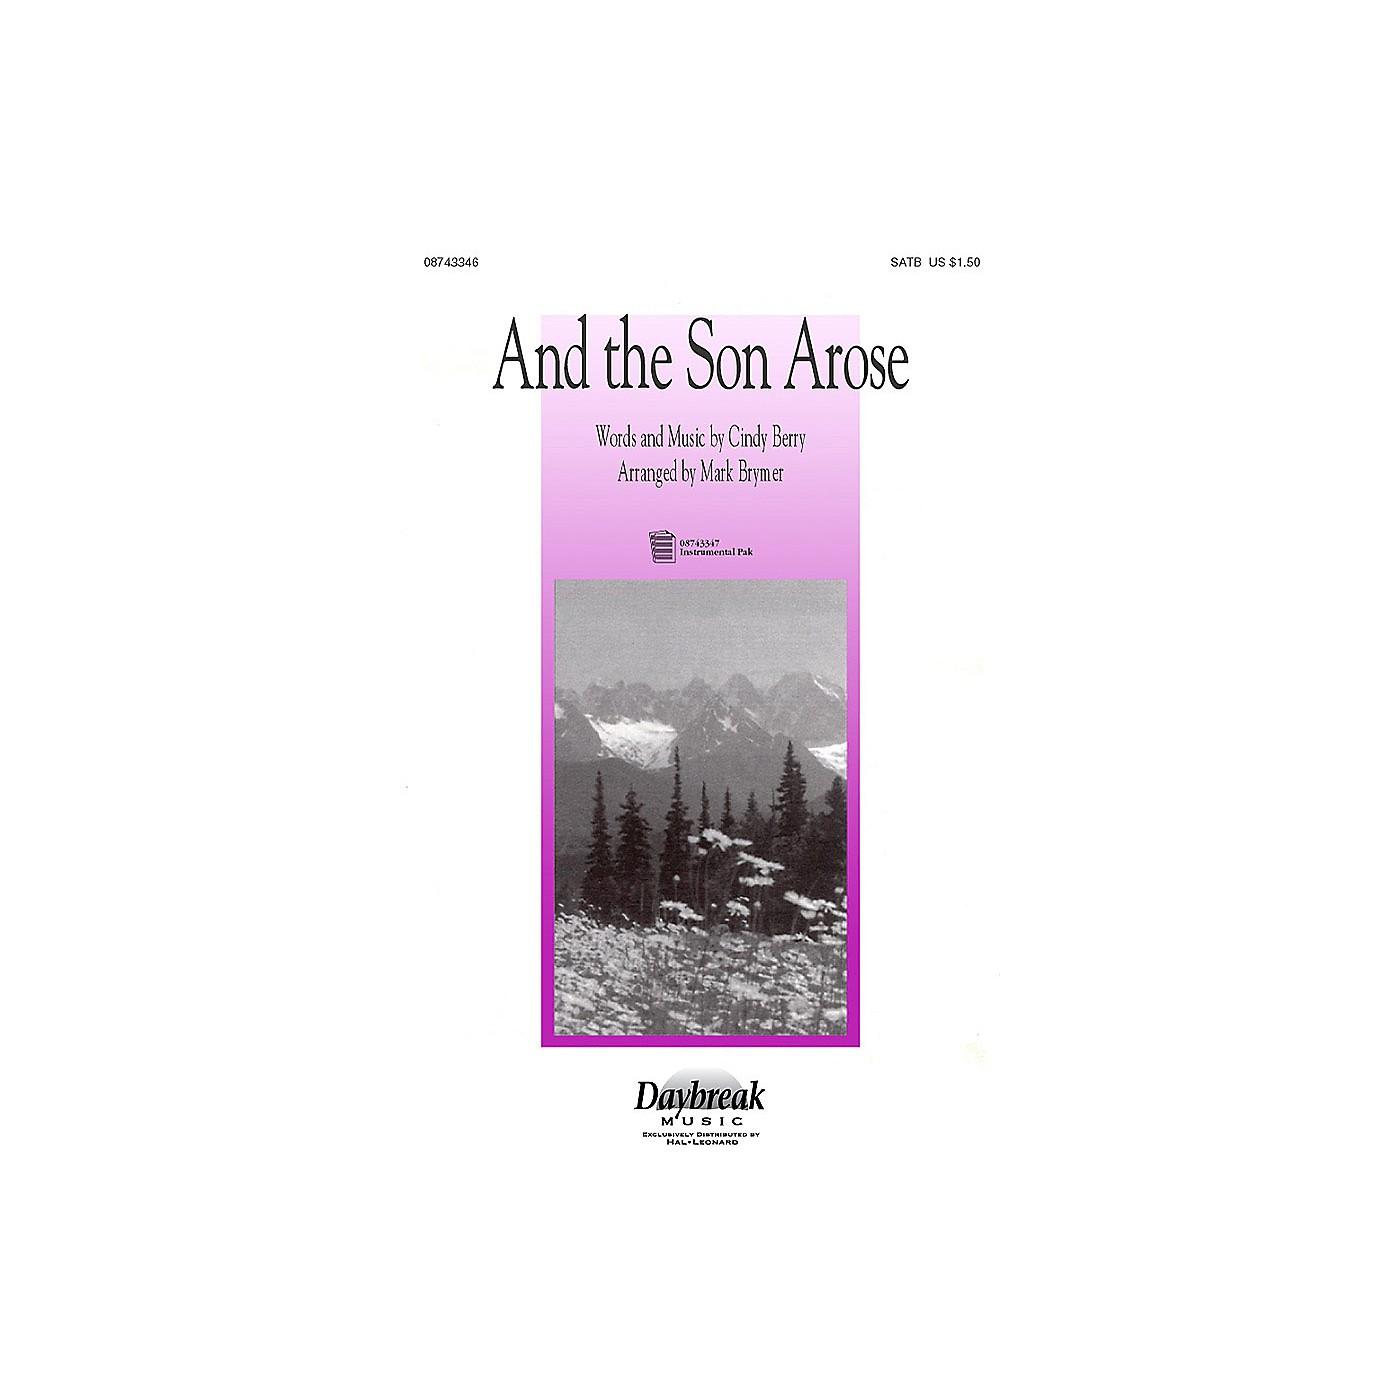 Hal Leonard And the Son Arose (SATB) SATB arranged by Mark Brymer thumbnail